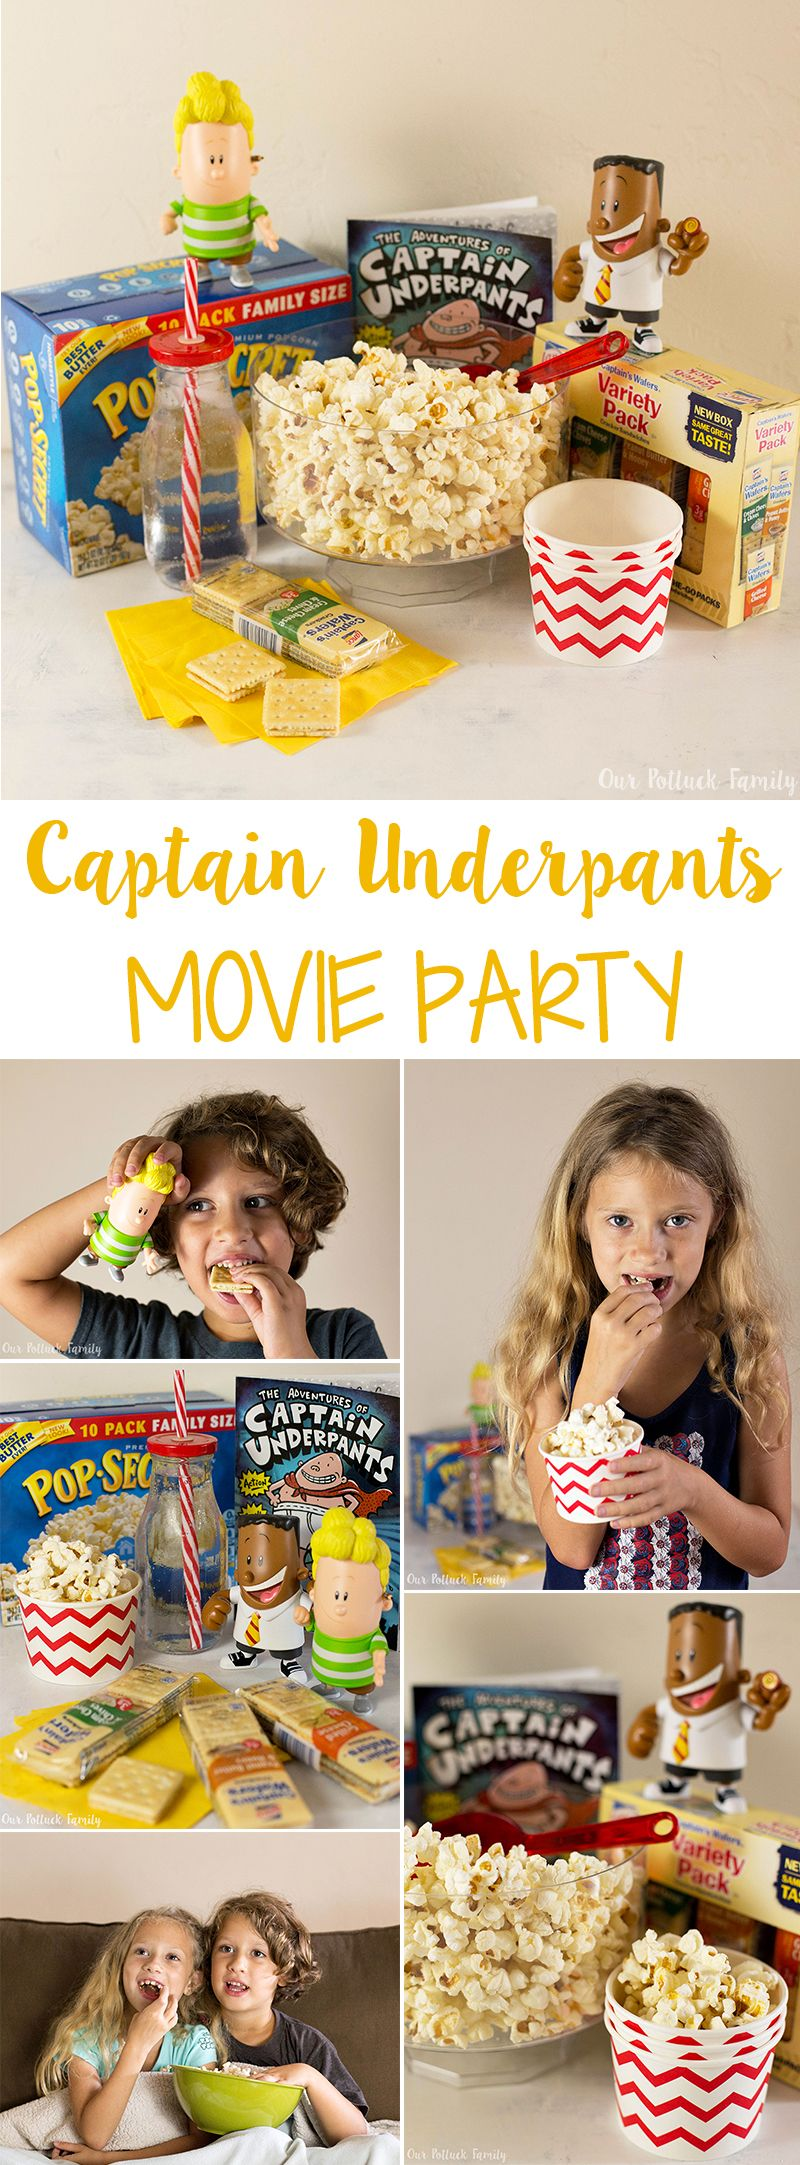 Captain Underpants Movie Party #epicmovie